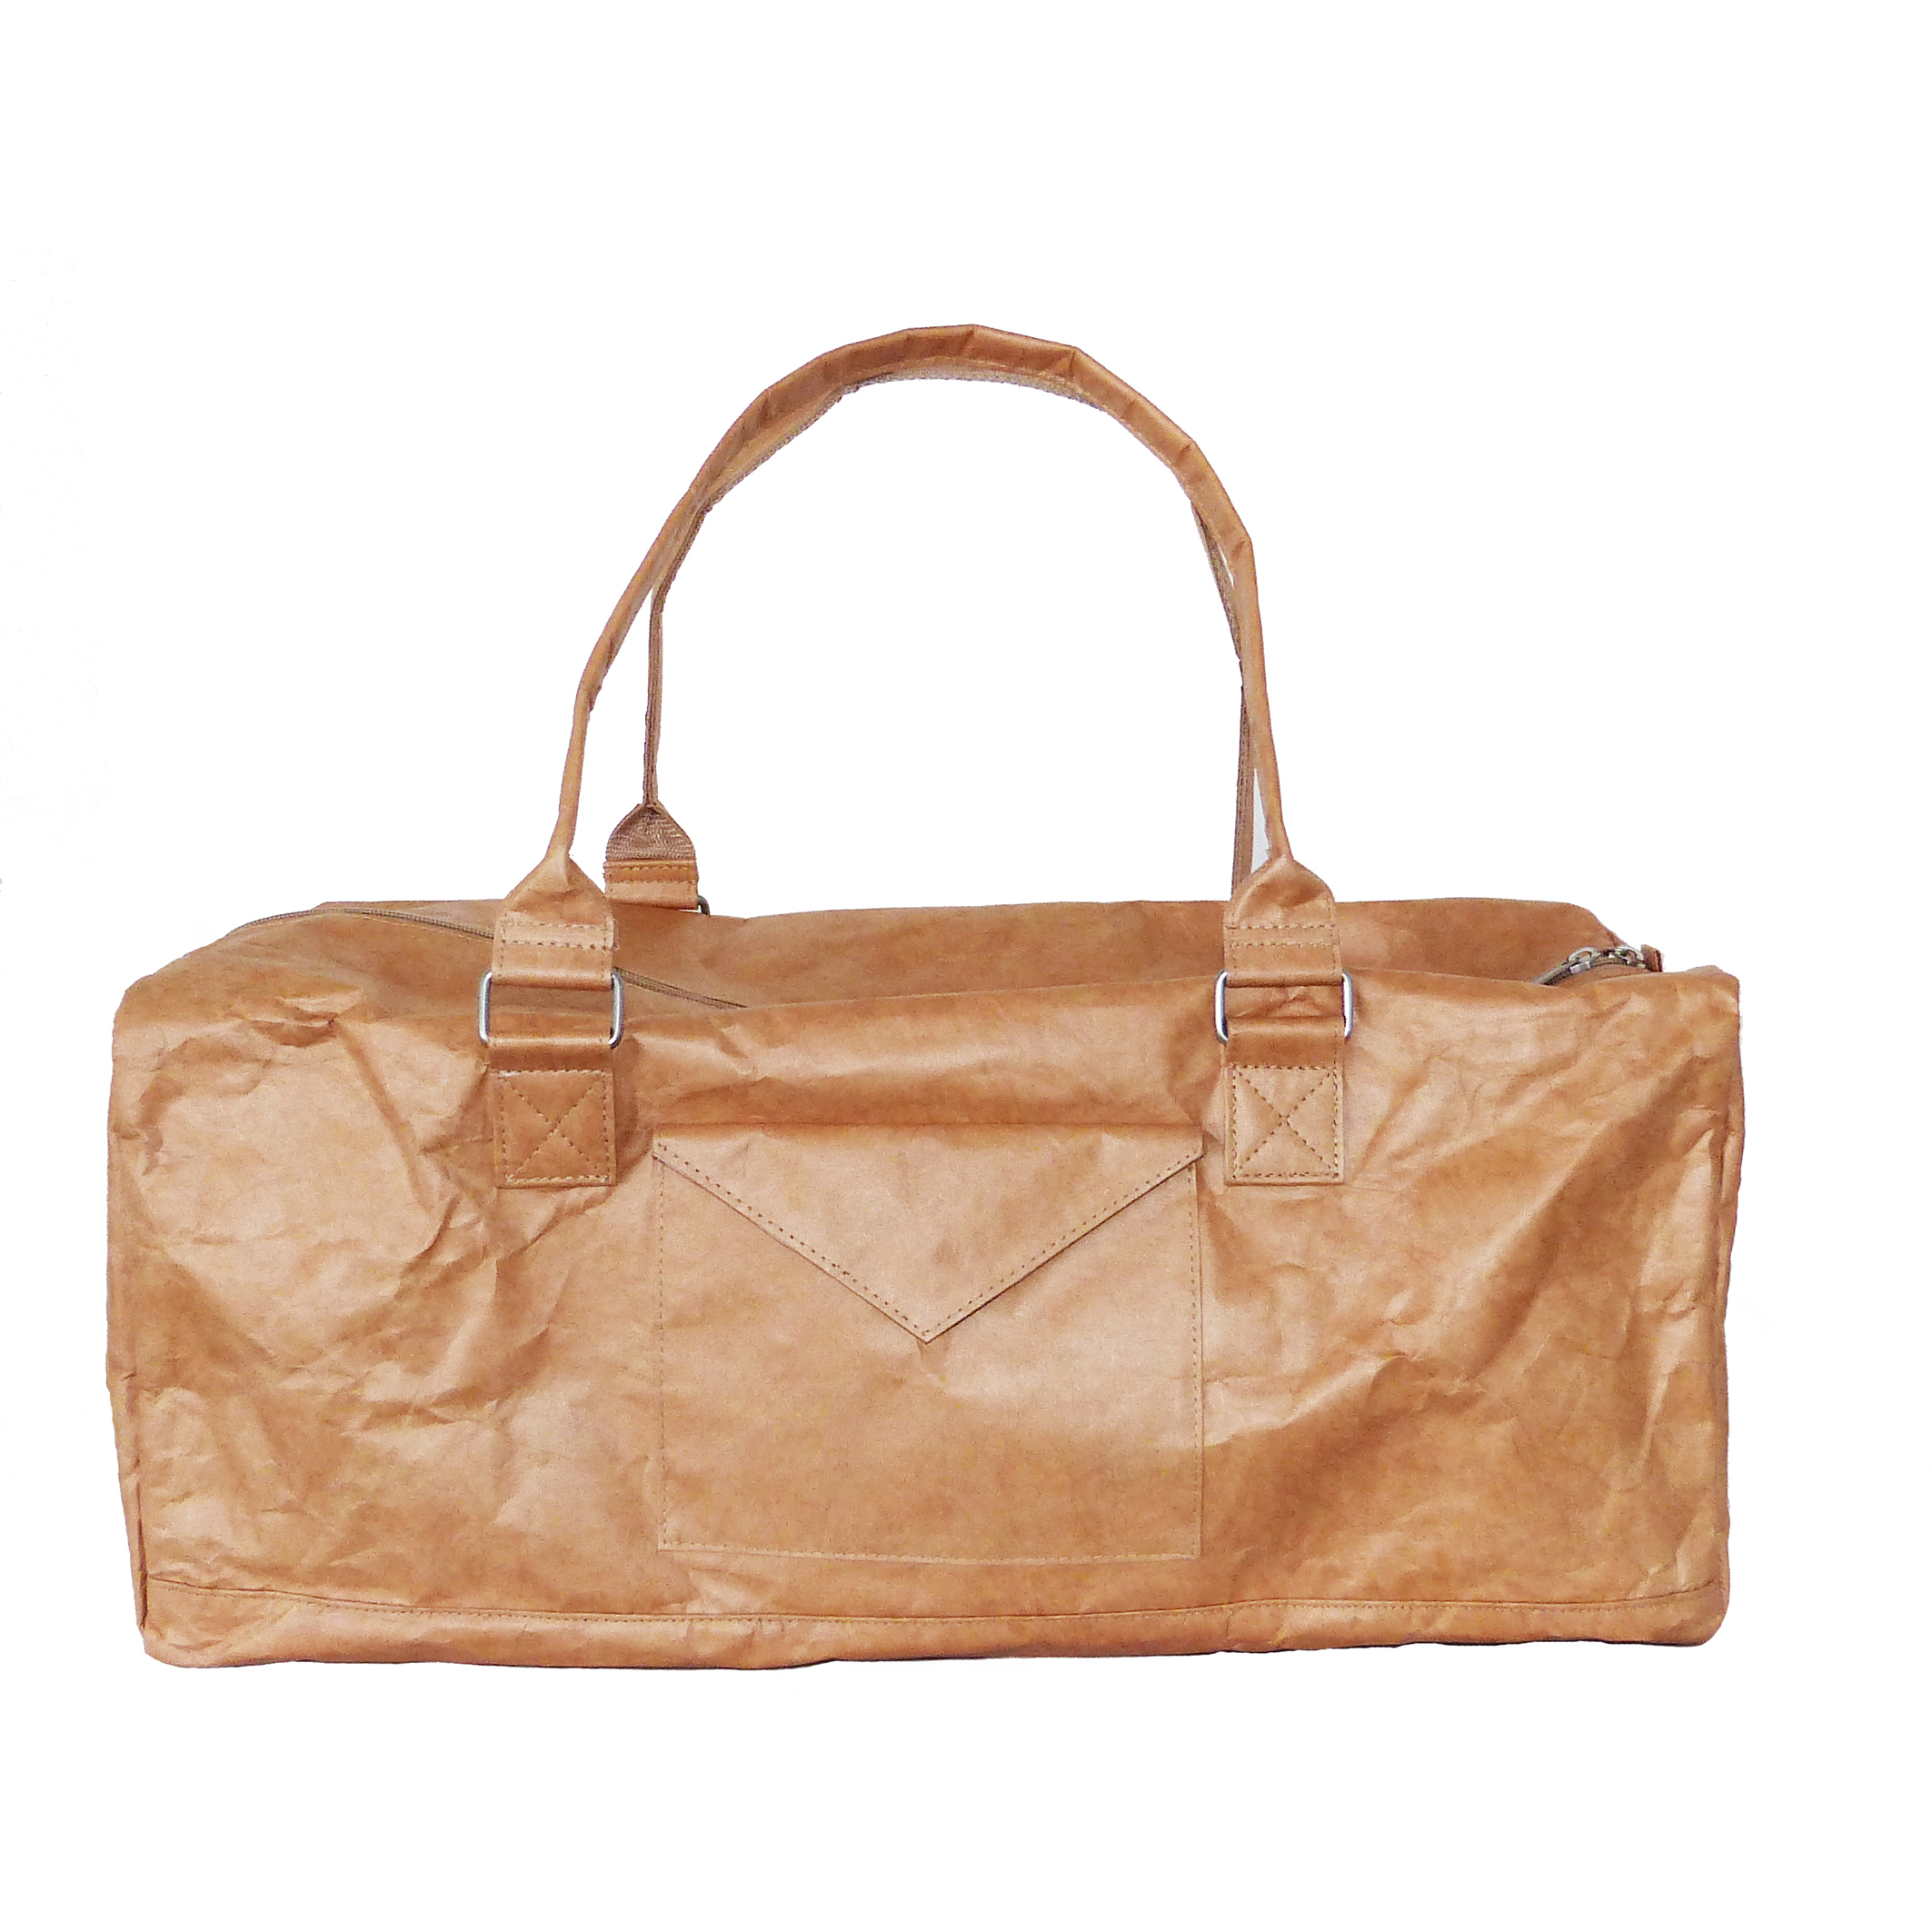 lightweight brown tyvek travel bag with brown zip